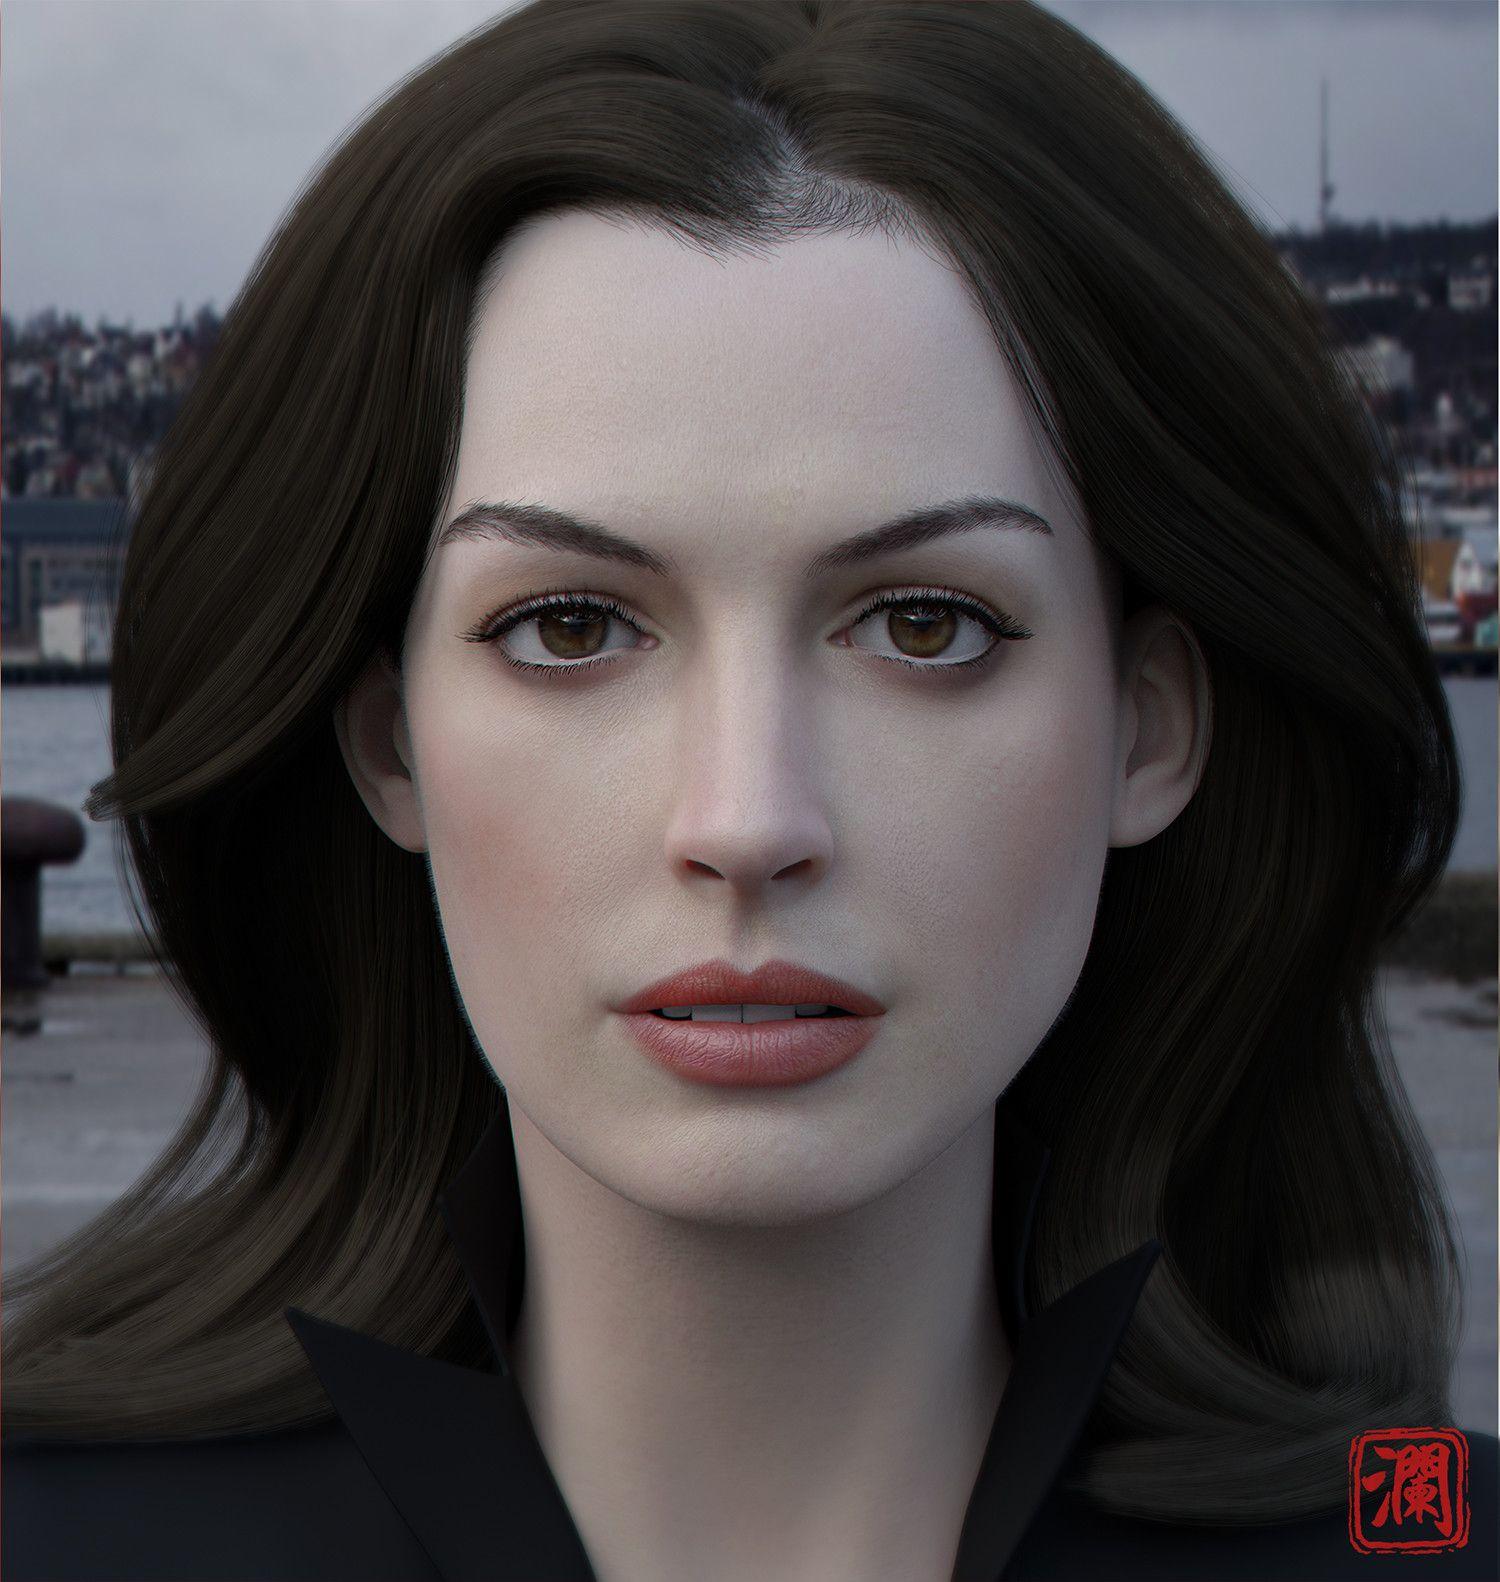 ArtStation - Anne Hathaway, Wang Lanye